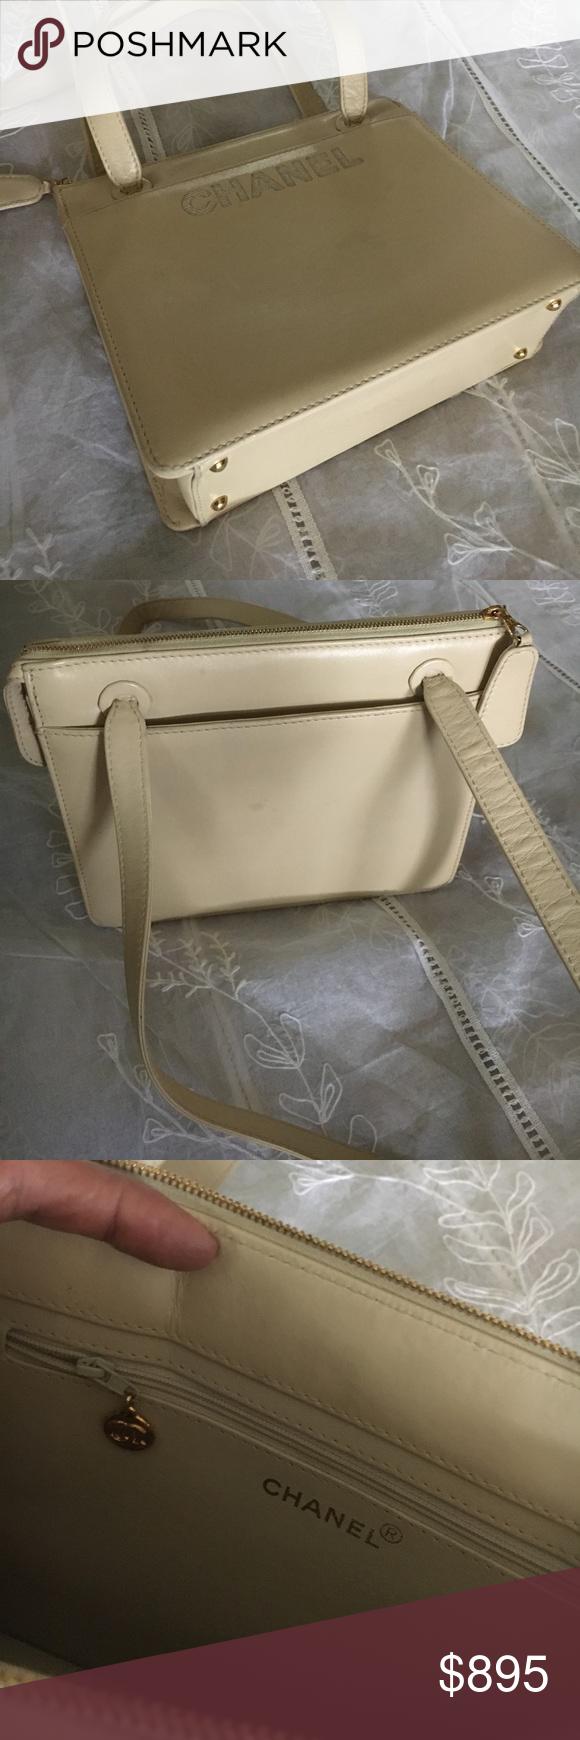 2ac1bb4e984ea1 Spotted while shopping on Poshmark: Vintage Chanel handbag! #poshmark  #fashion #shopping #style #CHANEL #Handbags